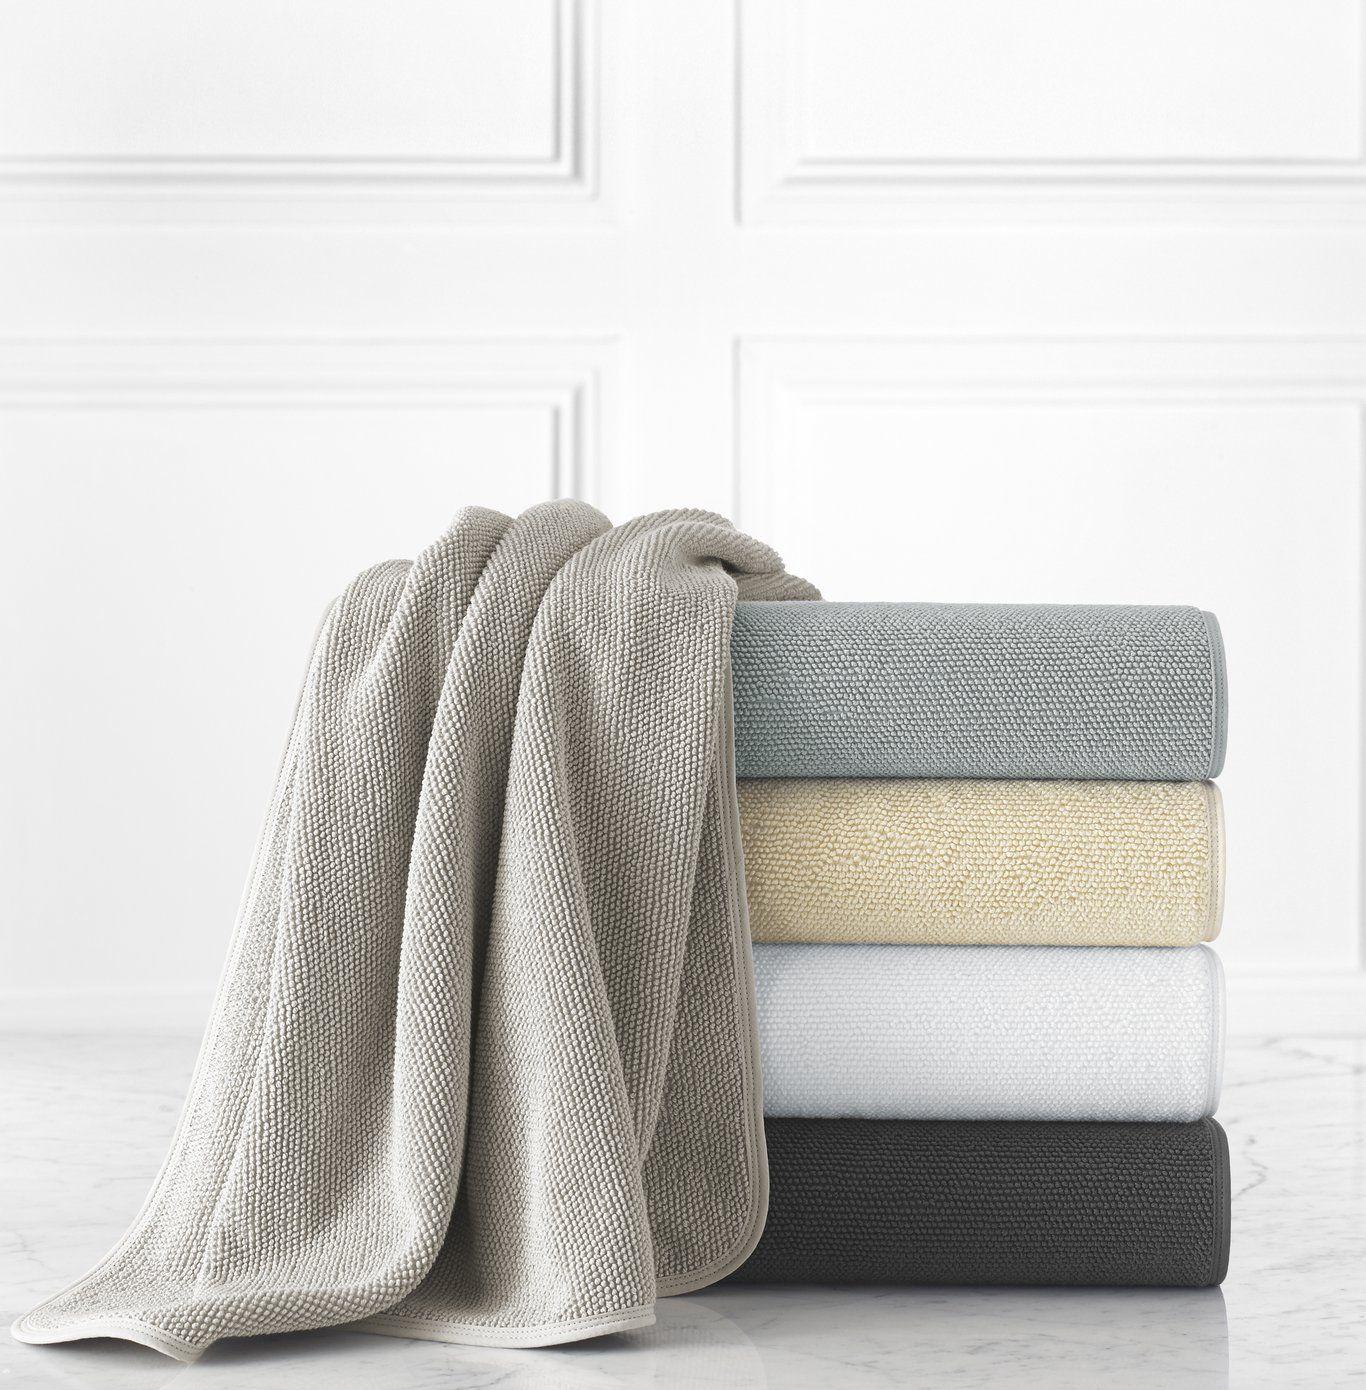 Cobblestone Textured Towels Towel Cotton Towels Texture